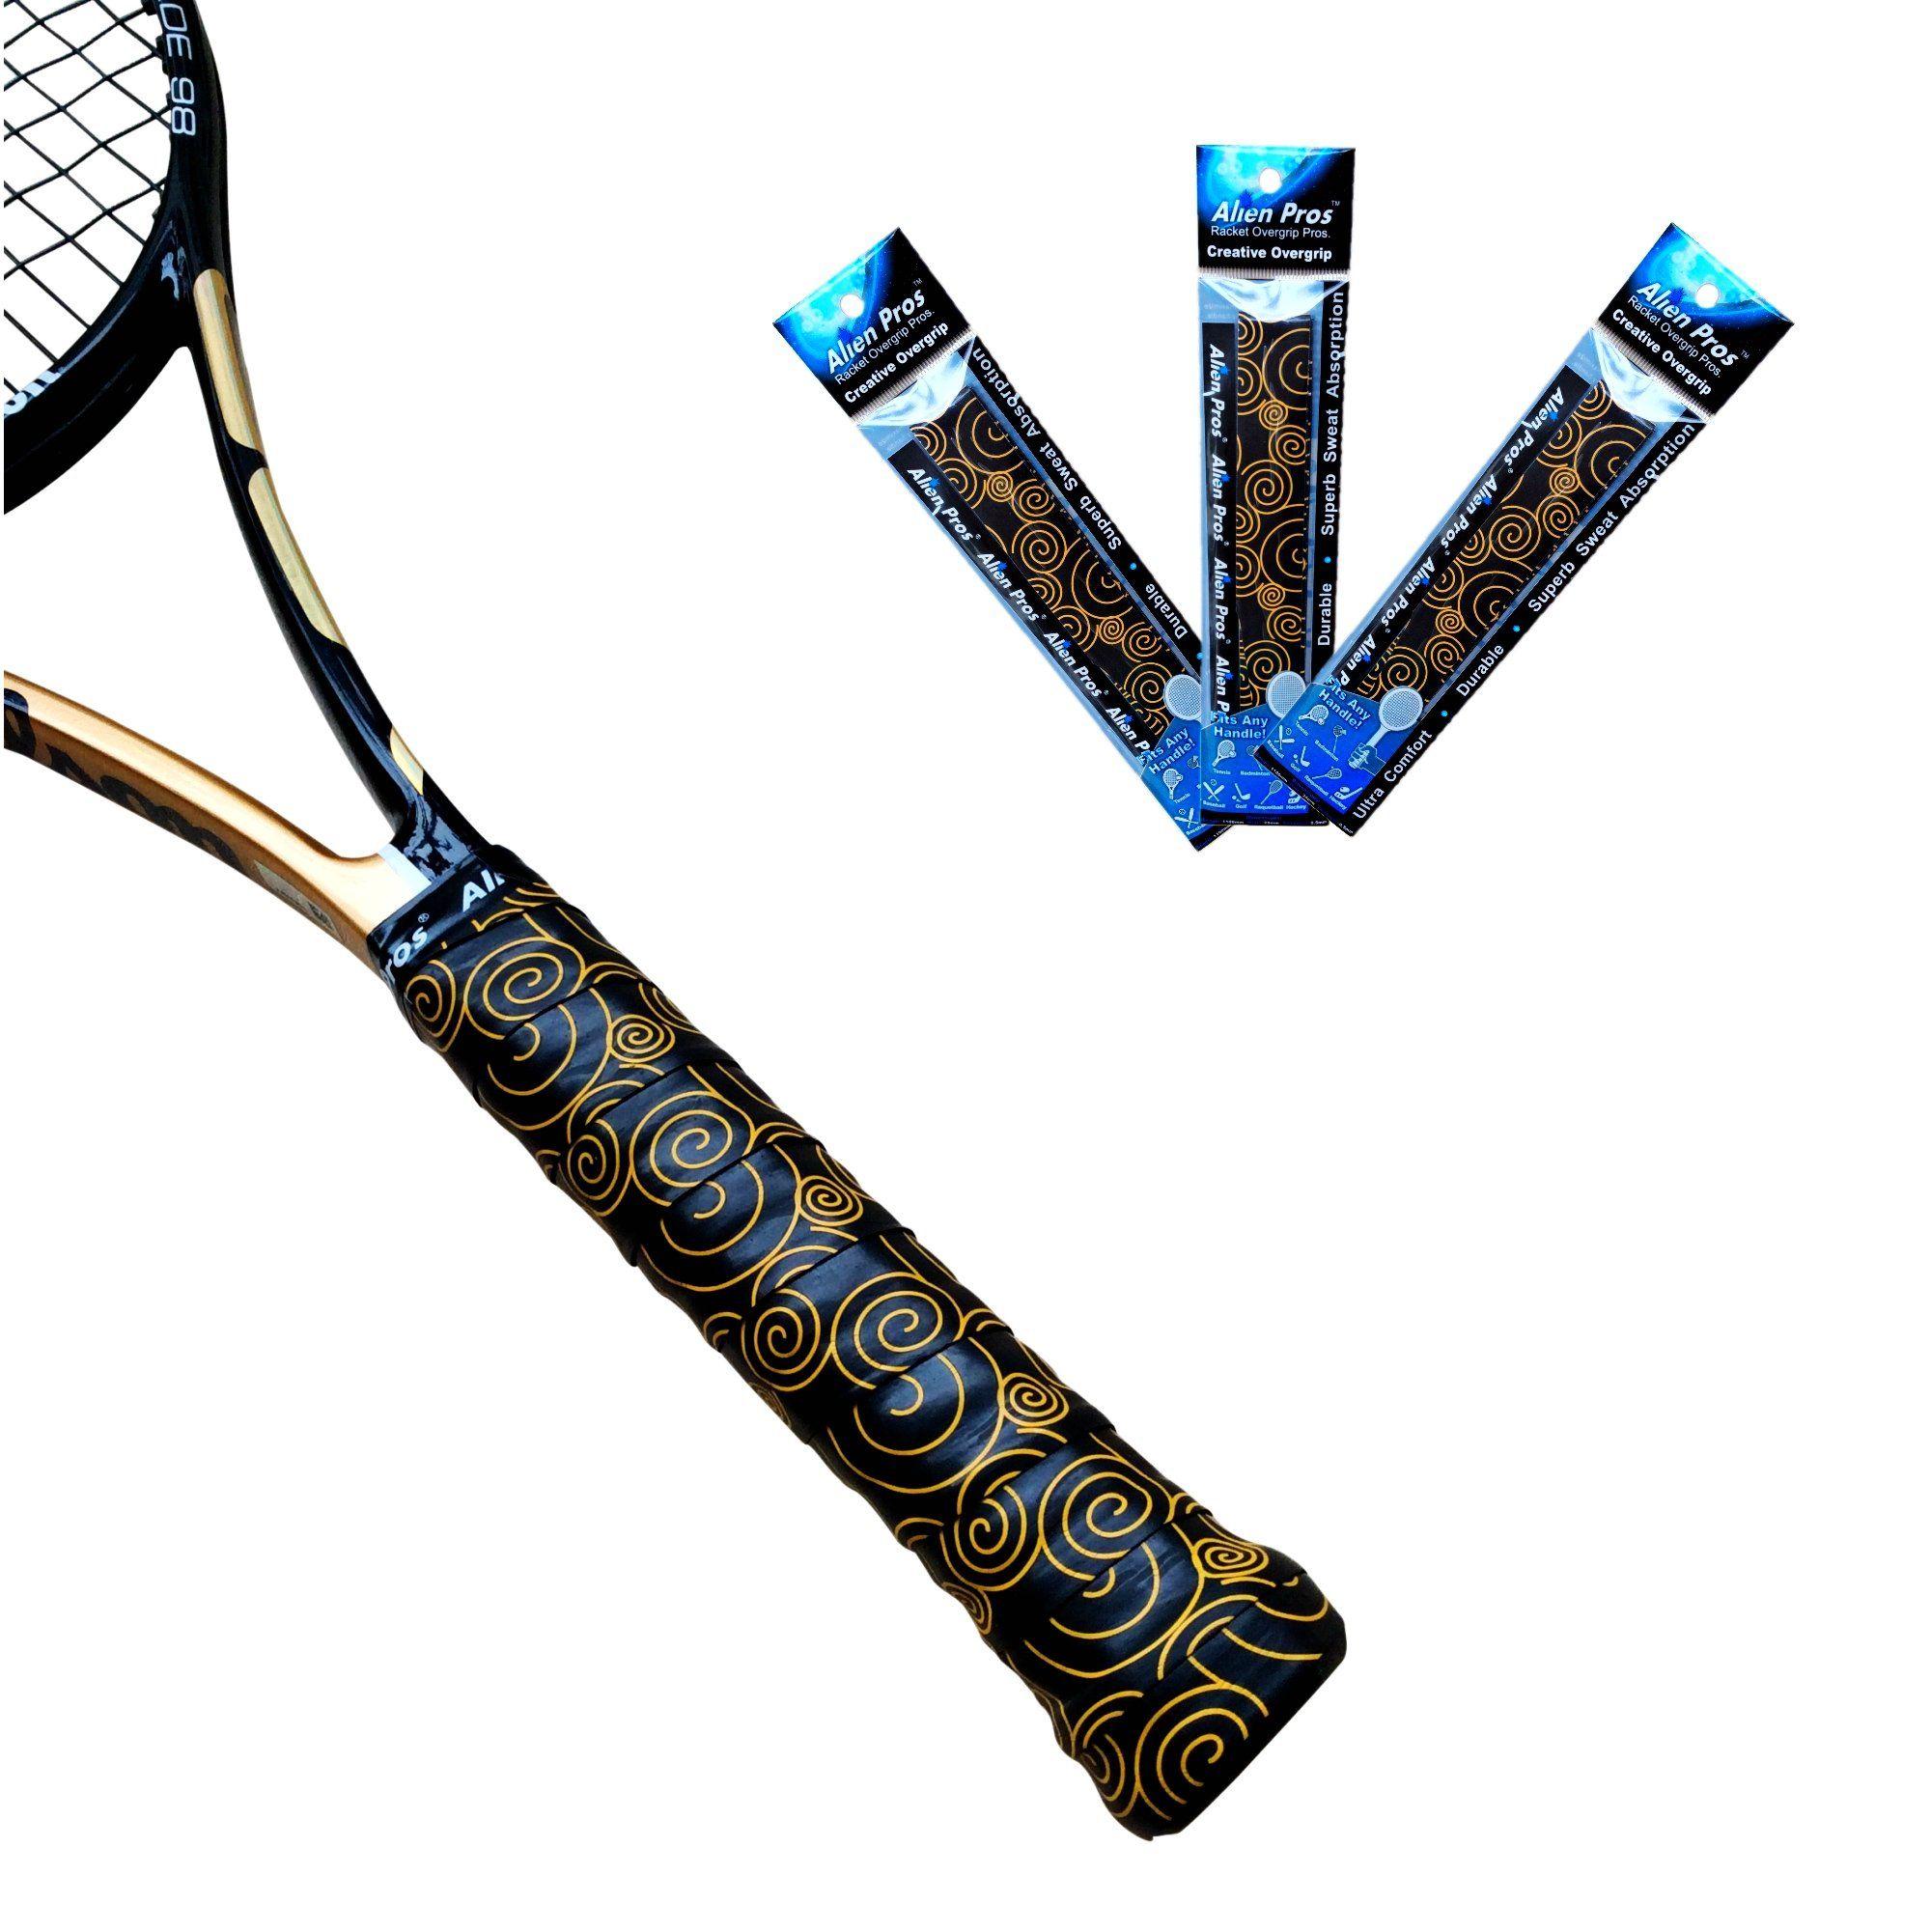 Robot Check Pro Tennis Tennis Grips Tennis Gifts